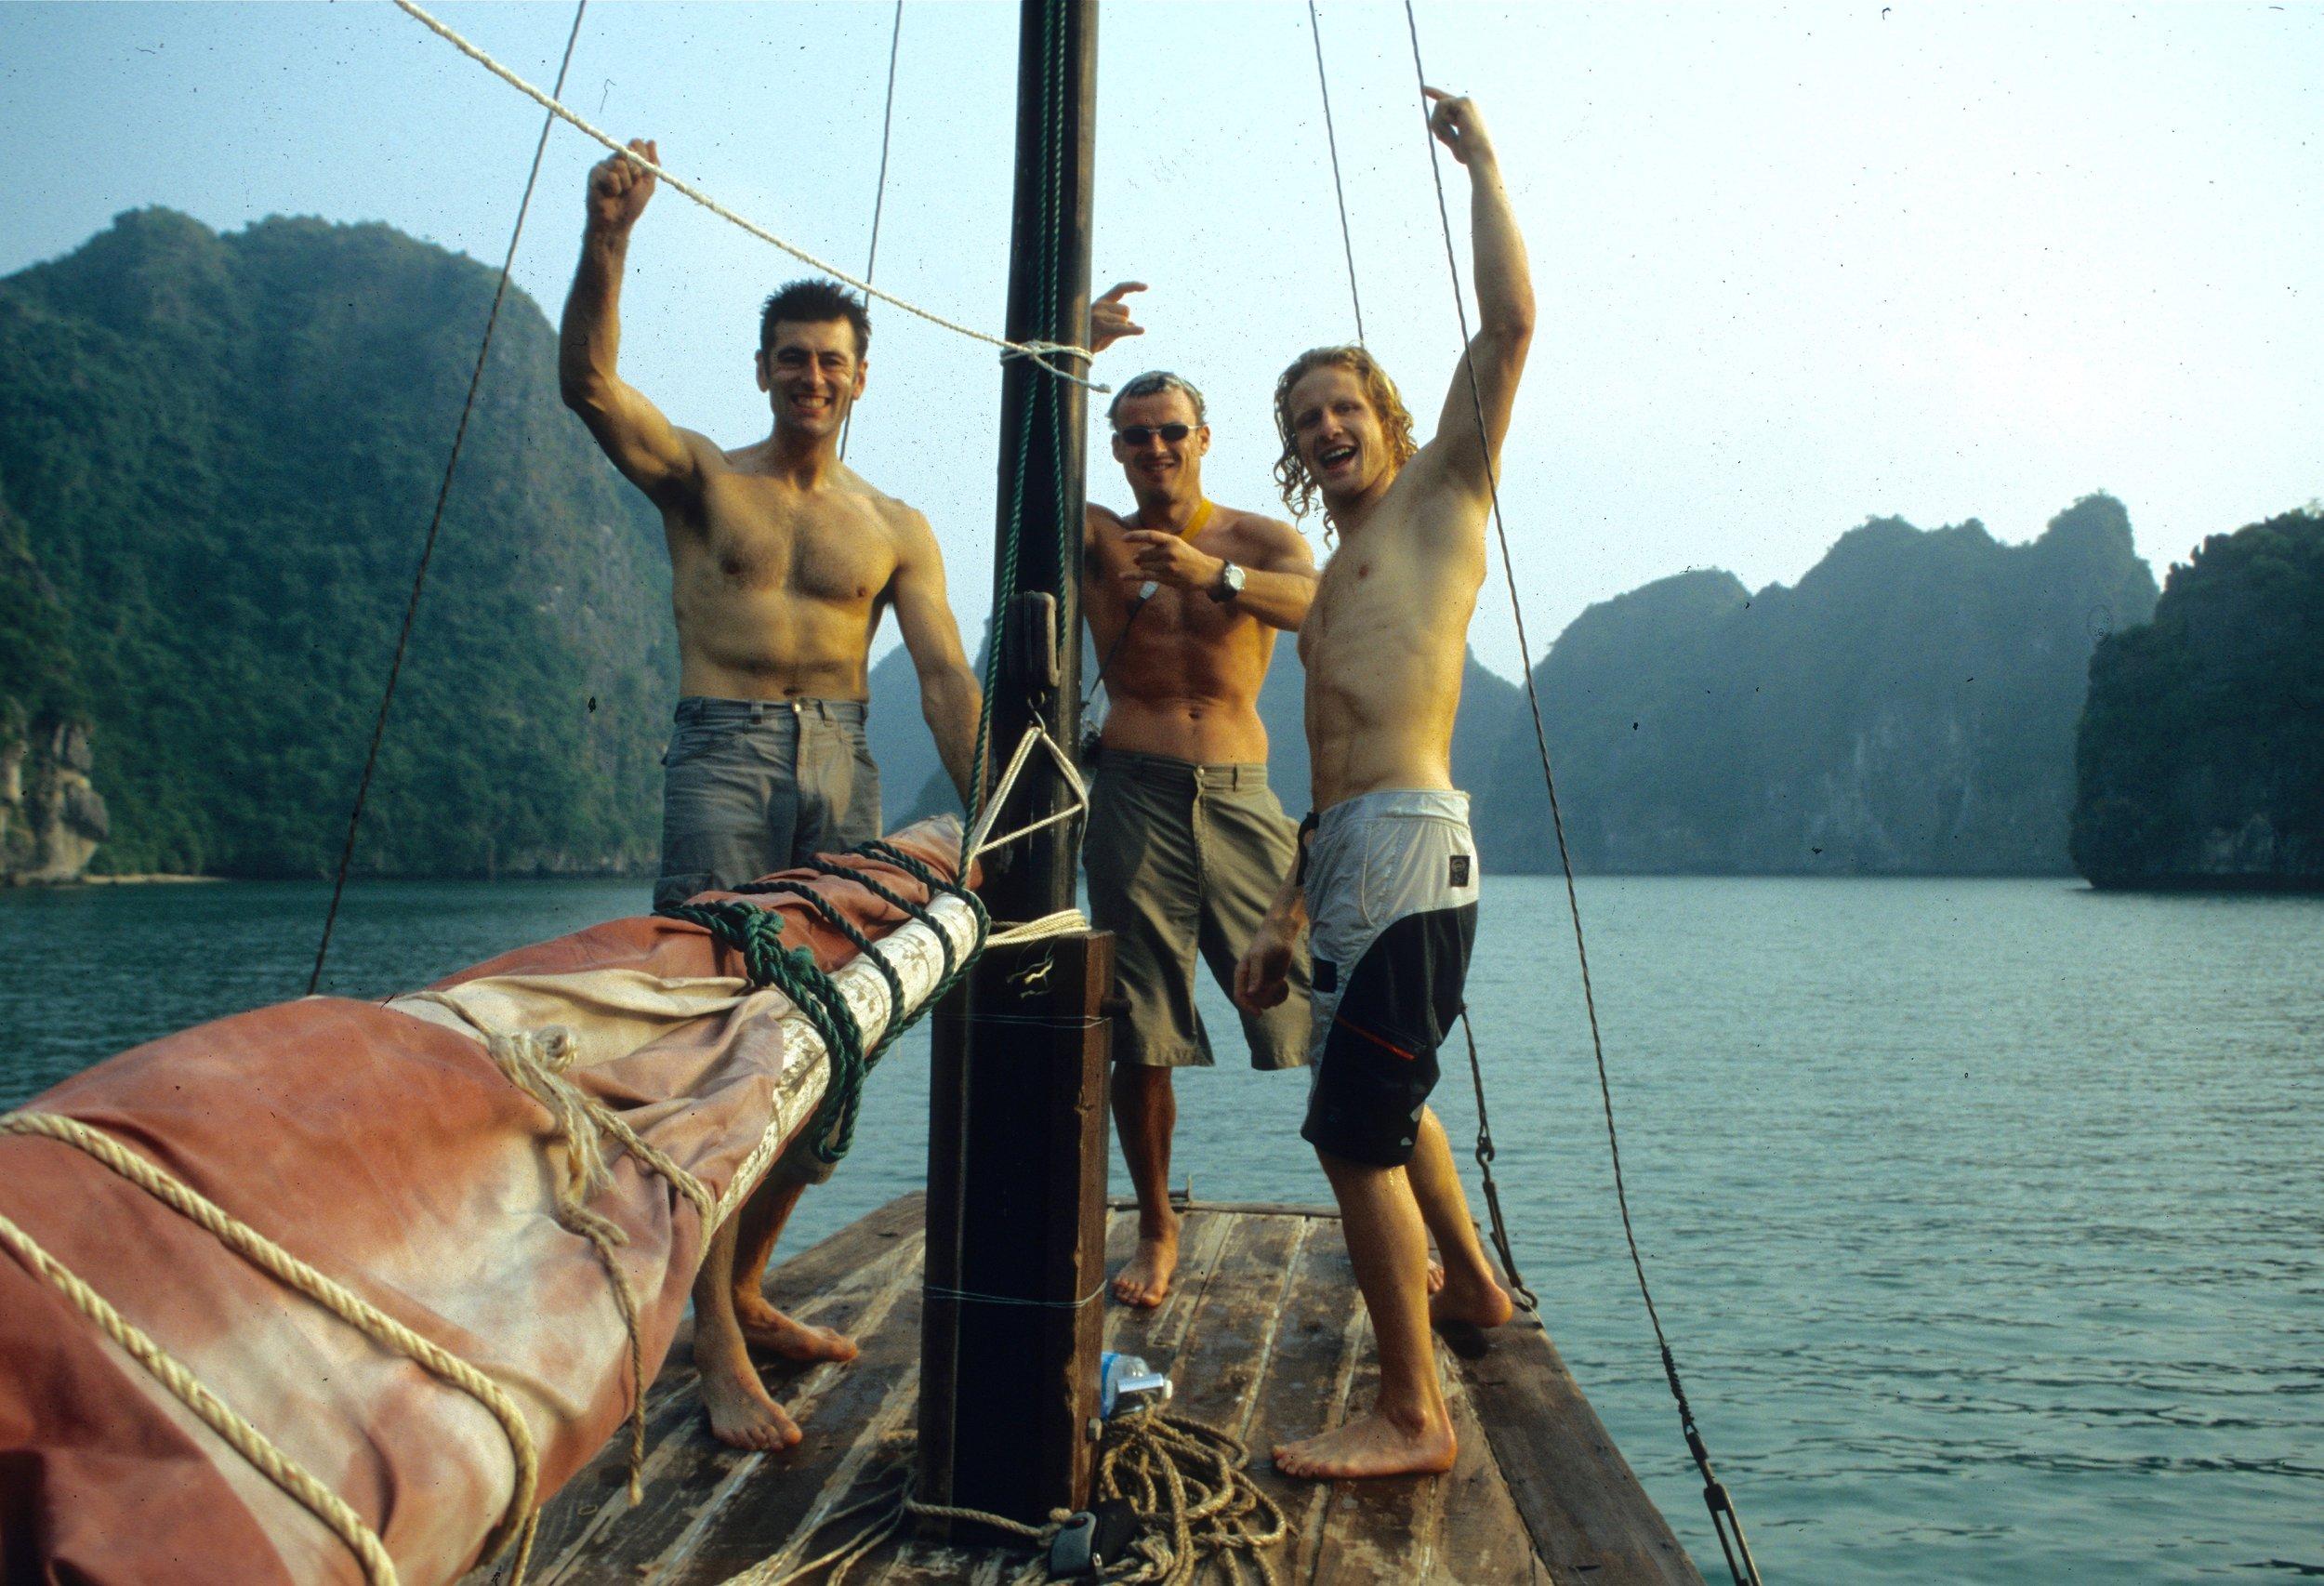 Jubilant Vietnam team 2003: Seb Grieve, Grant Farquhar & Tim Emmett. Photo: Gresham collection.